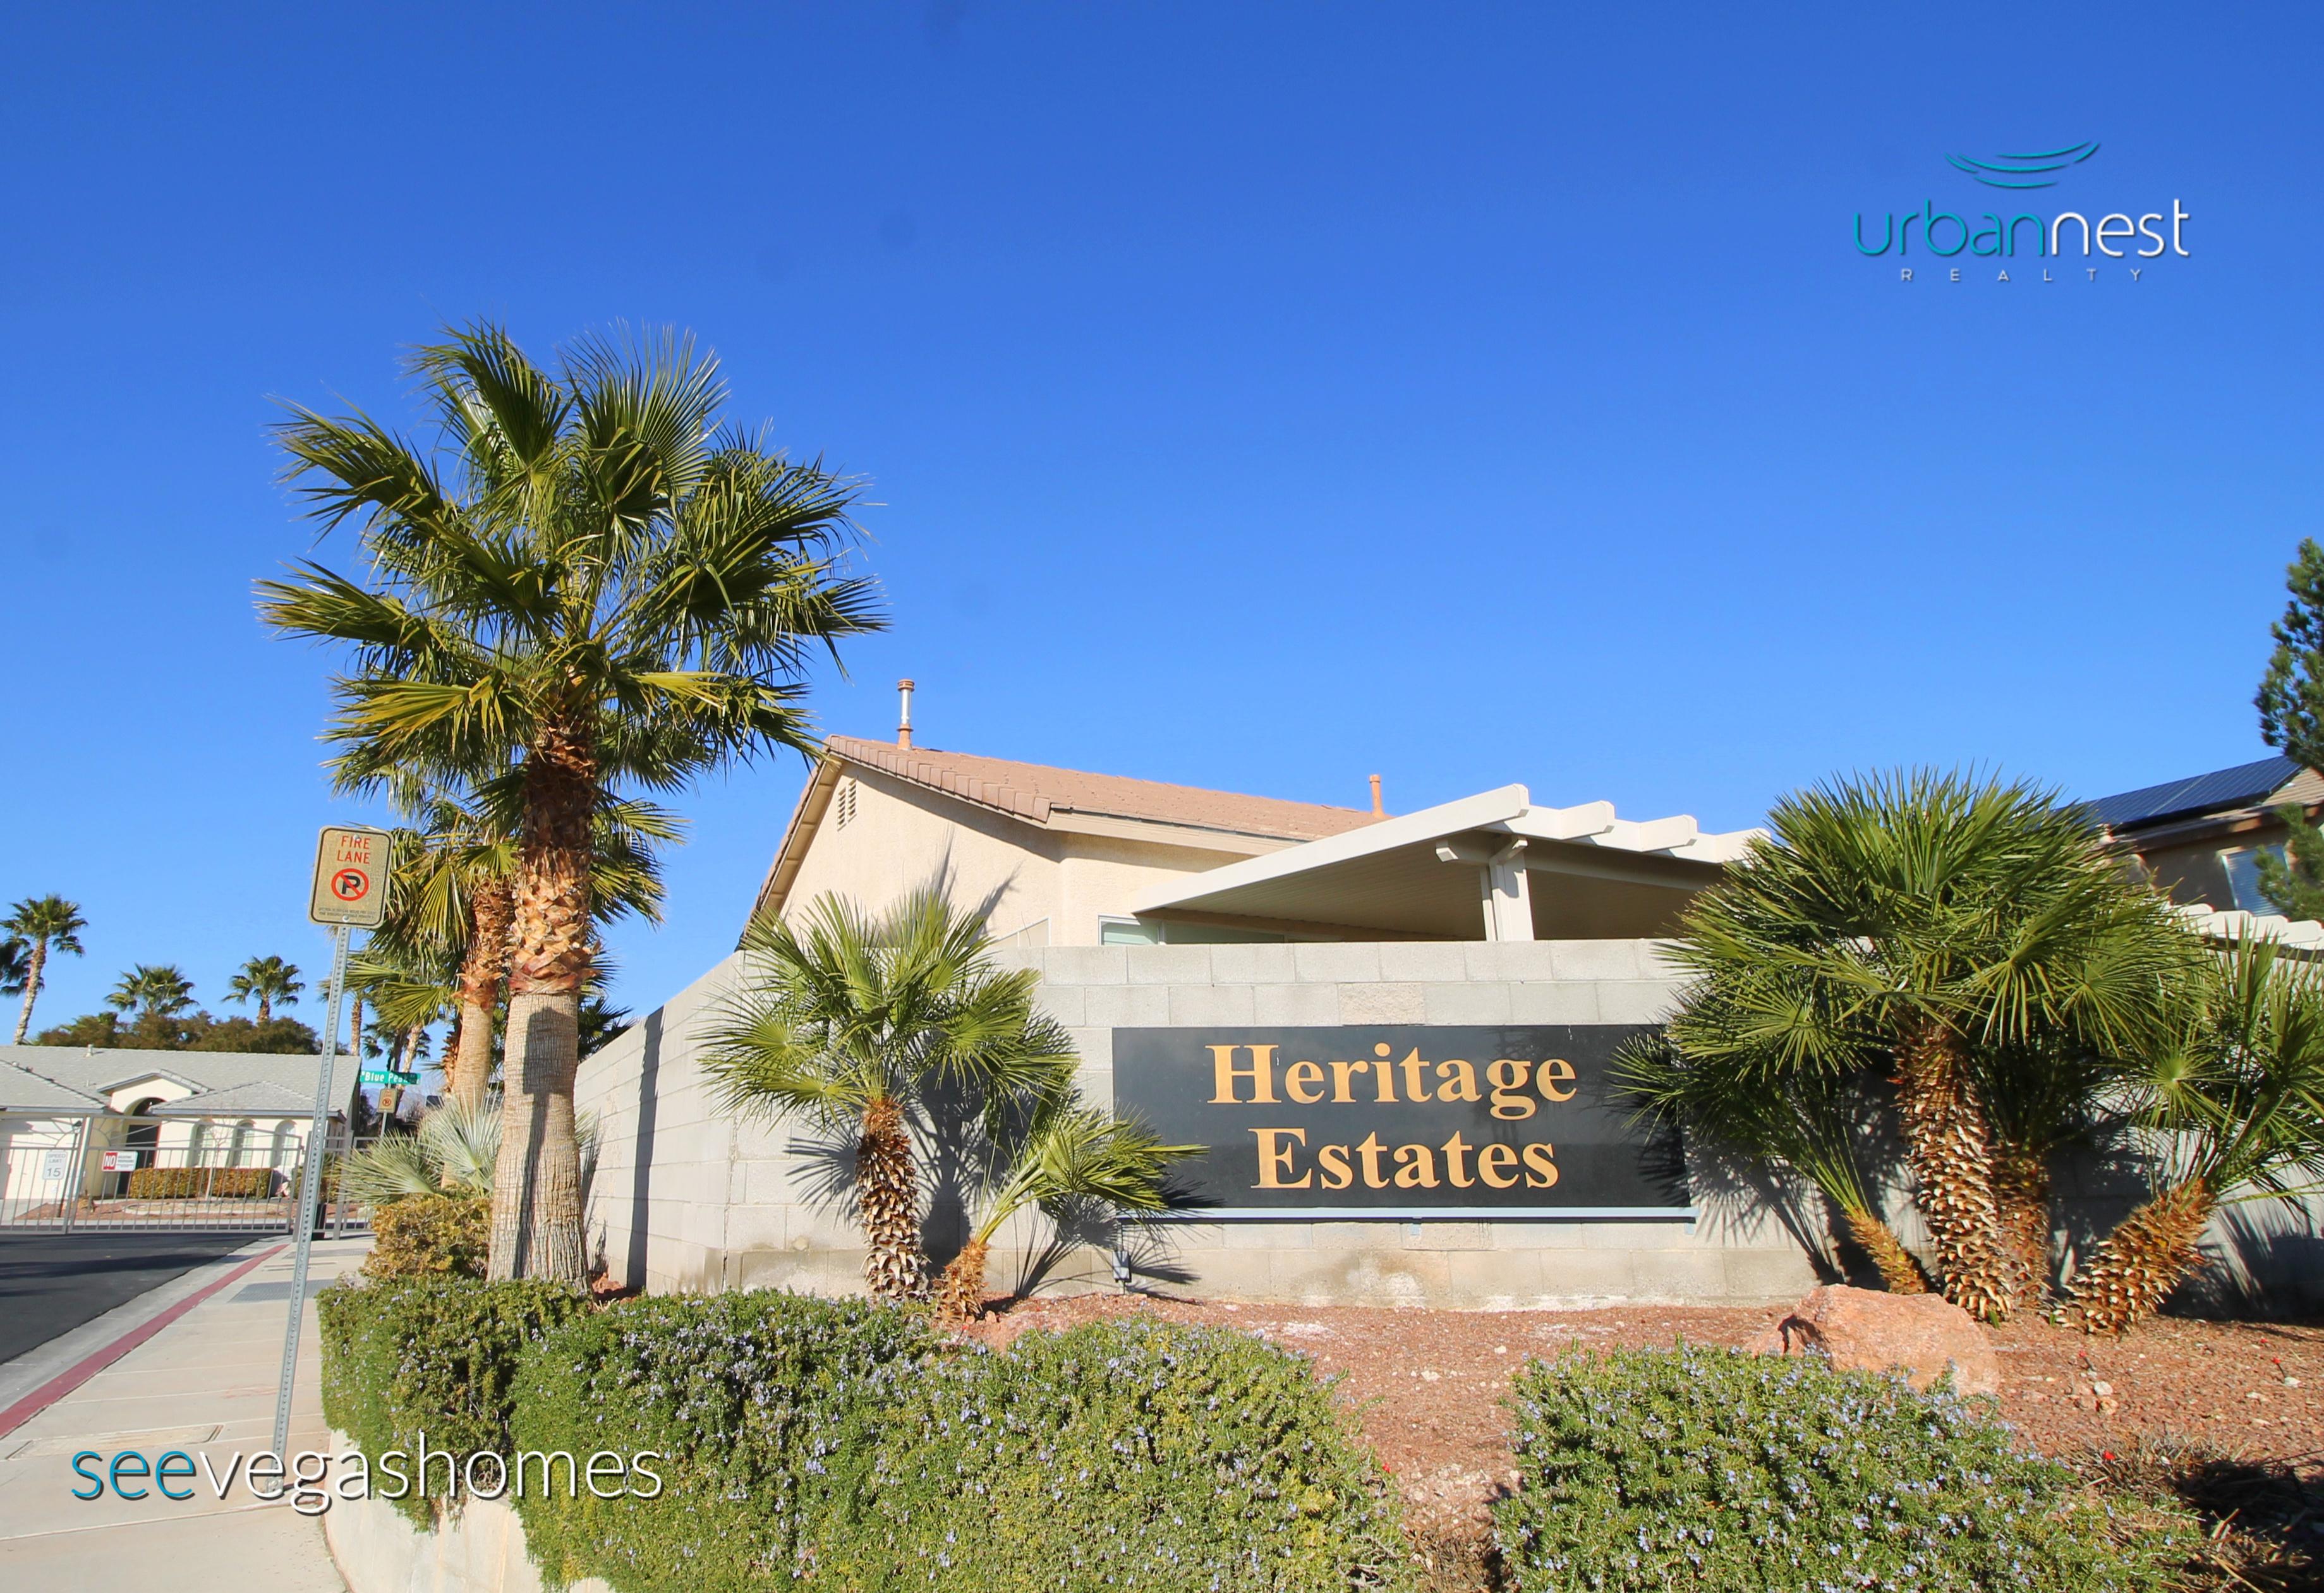 Heritage_Estates_Elkhorn-Leon_Las_Vegas_NV_89131_SeeVegasHomes